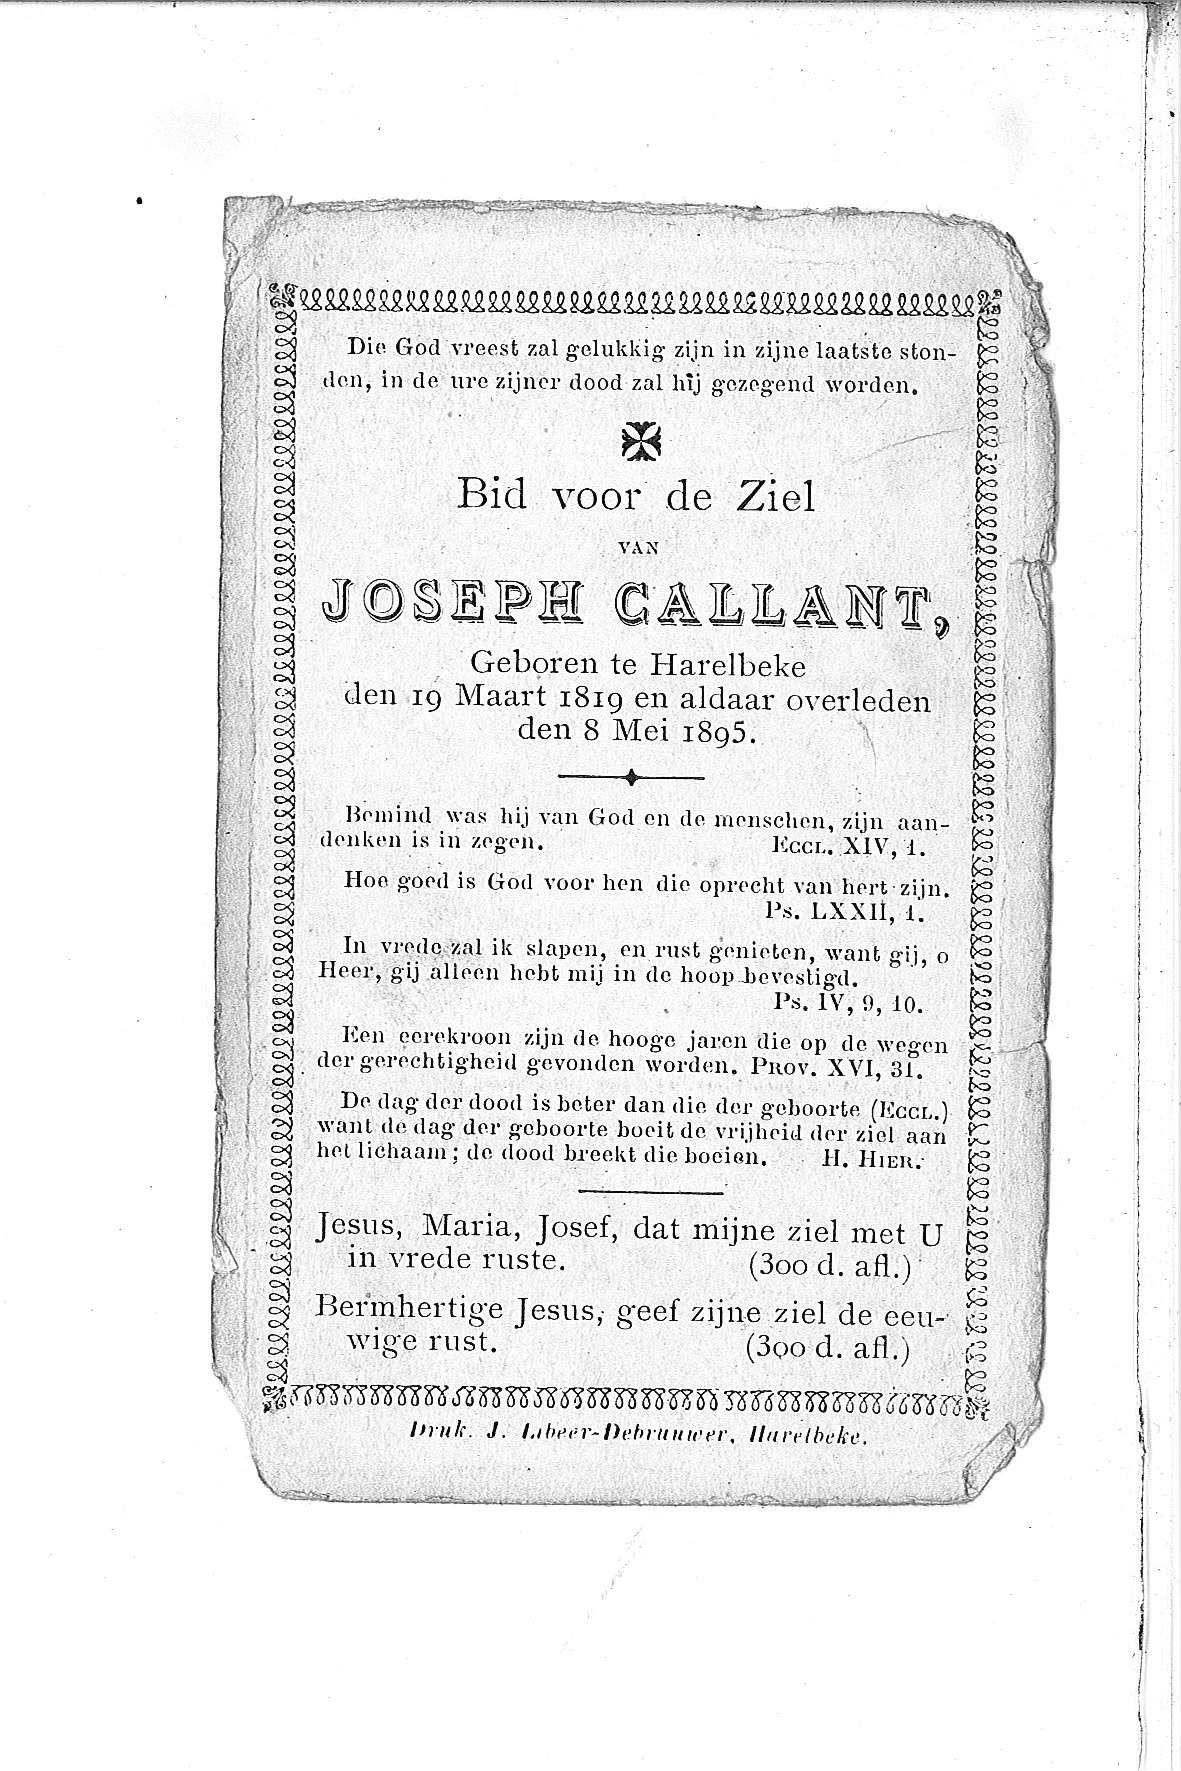 joseph(1895)20101104083918_00056.jpg